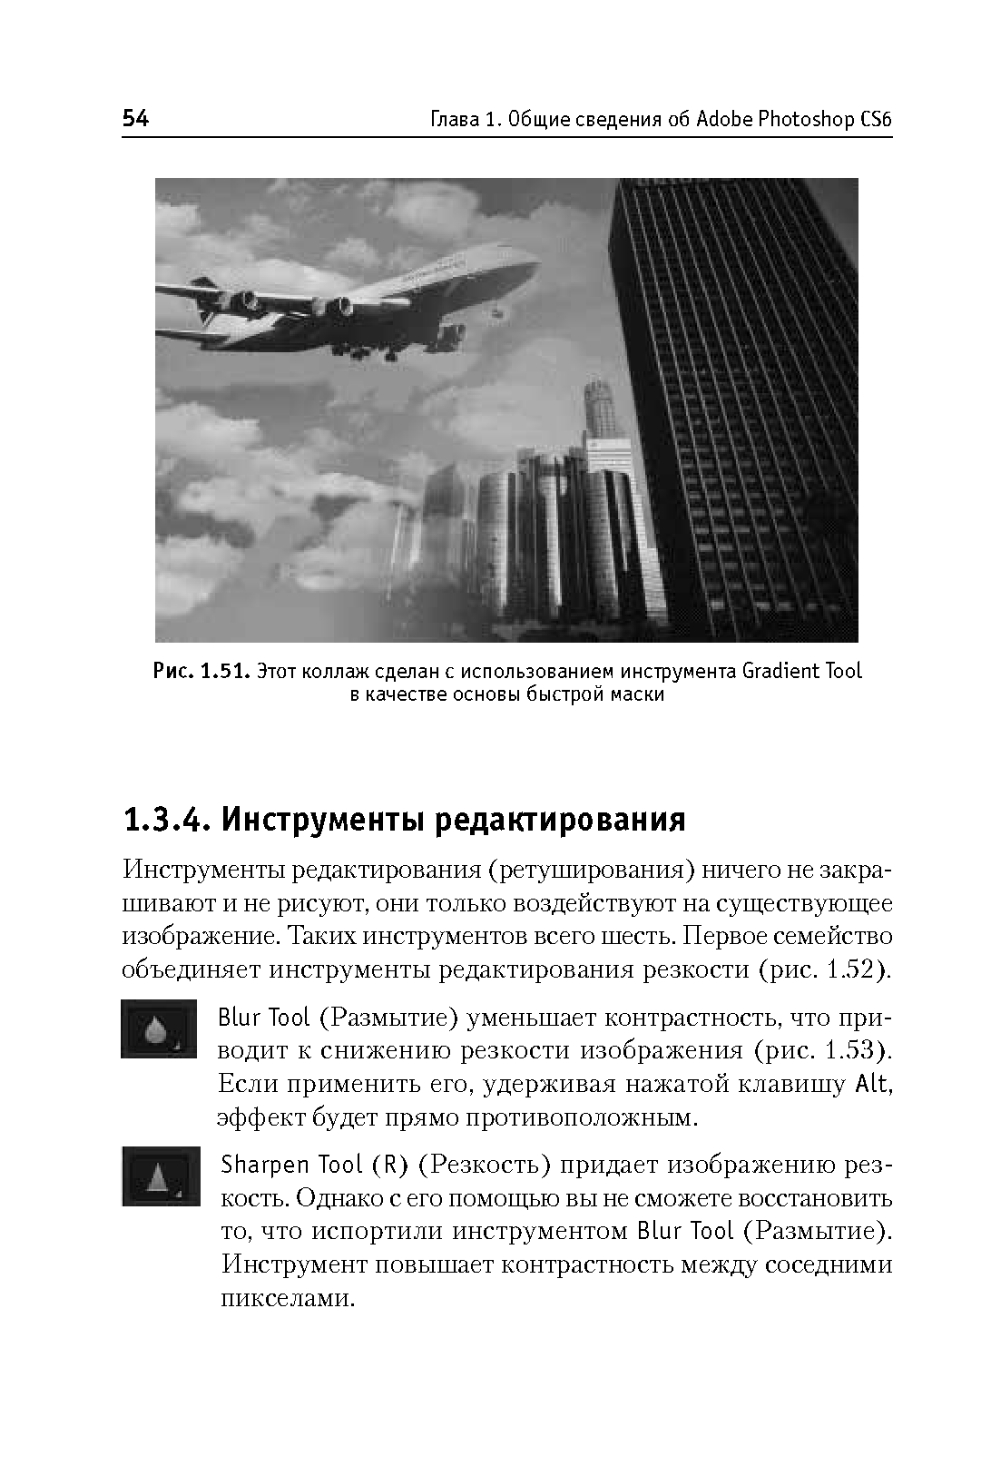 http://i1.imageban.ru/out/2013/11/10/a5906b5d058587a9ad94eb75f42d18eb.jpg